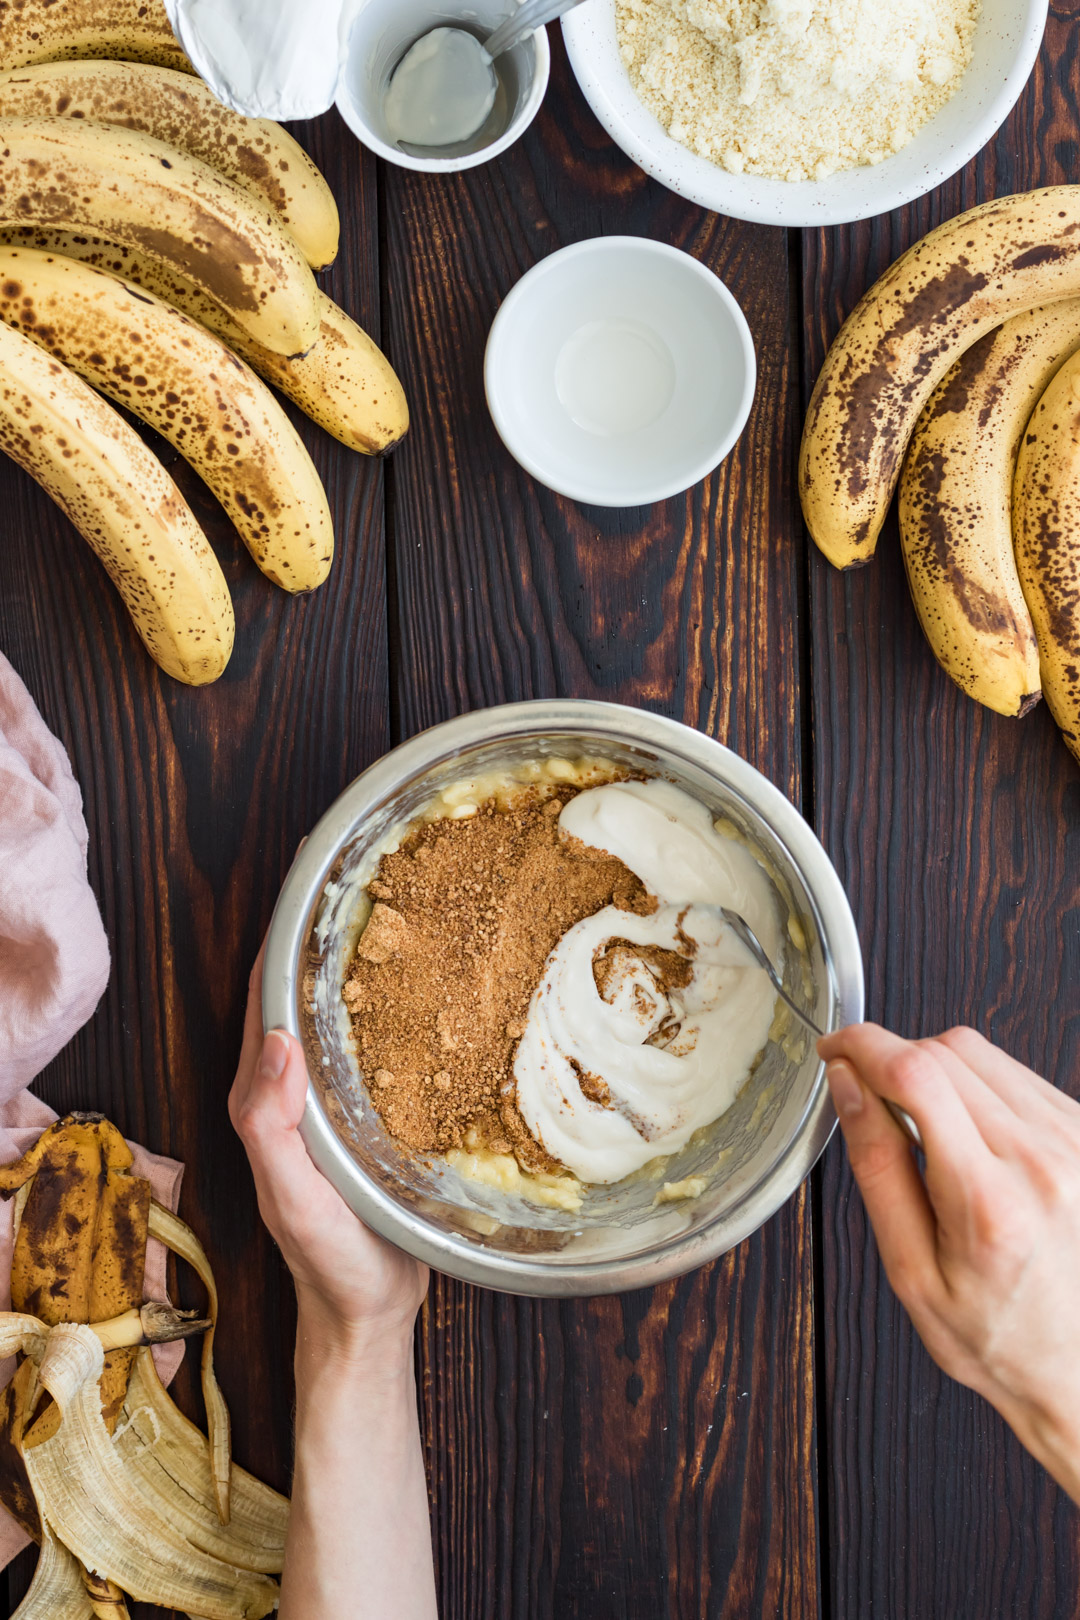 Vegan Gluten-free Banana Almond Tart